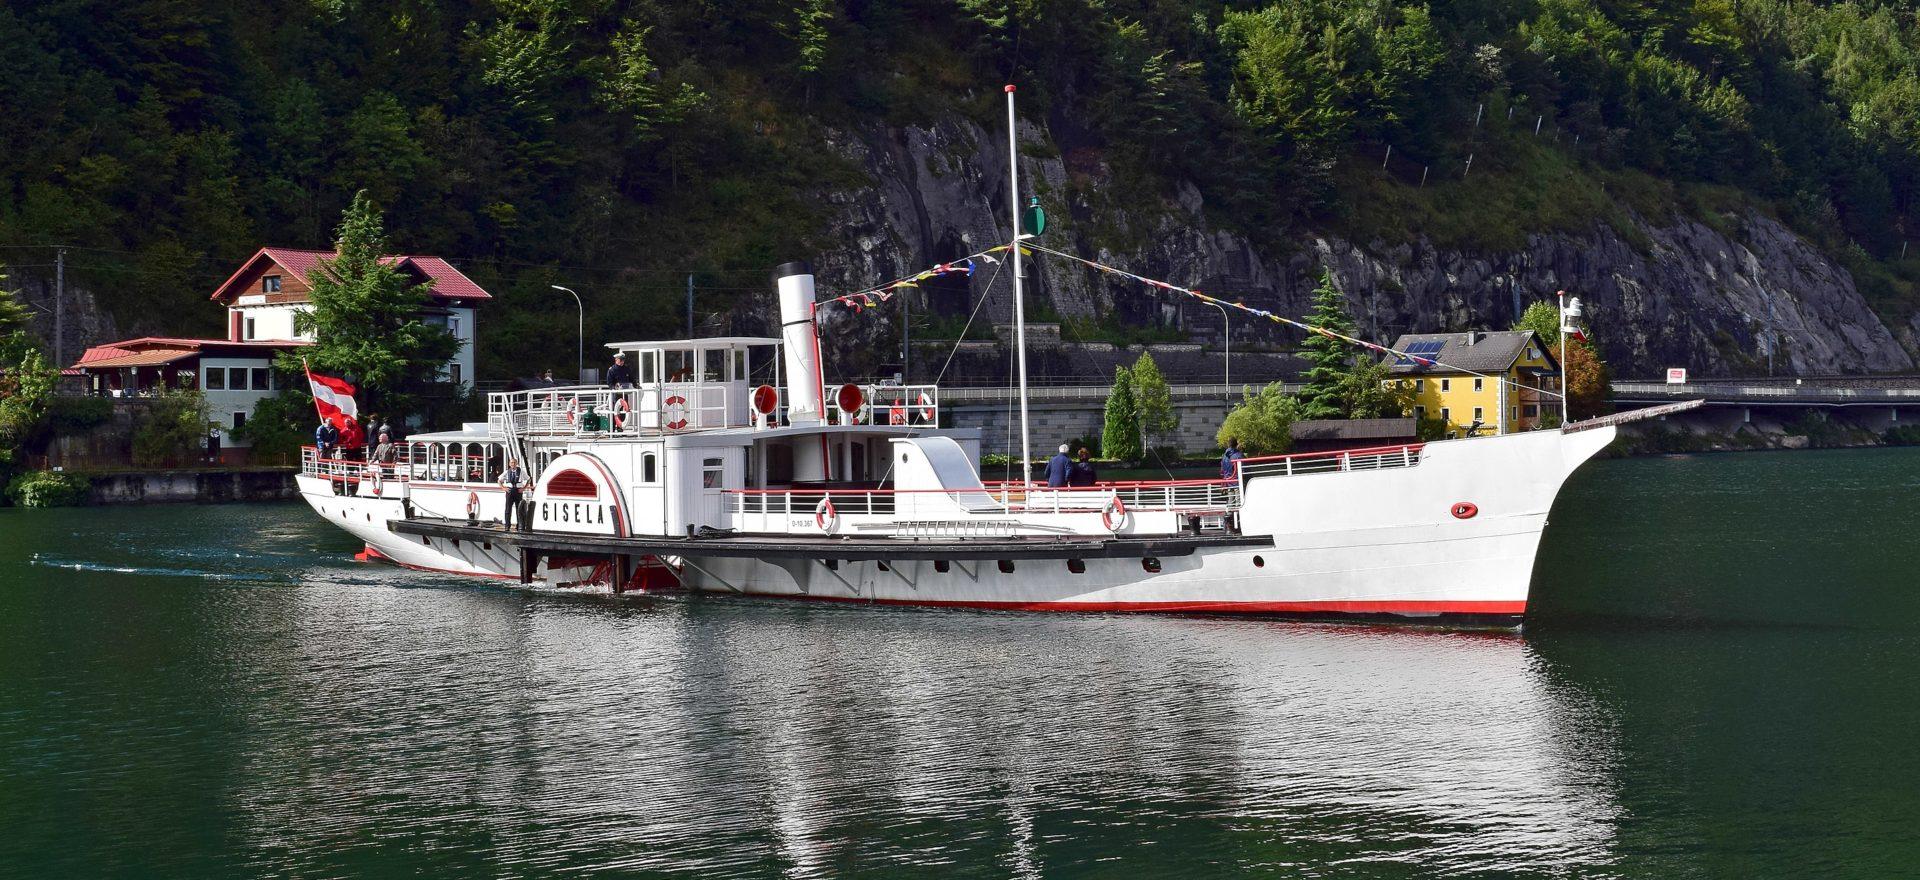 Dampfschiff Gisela